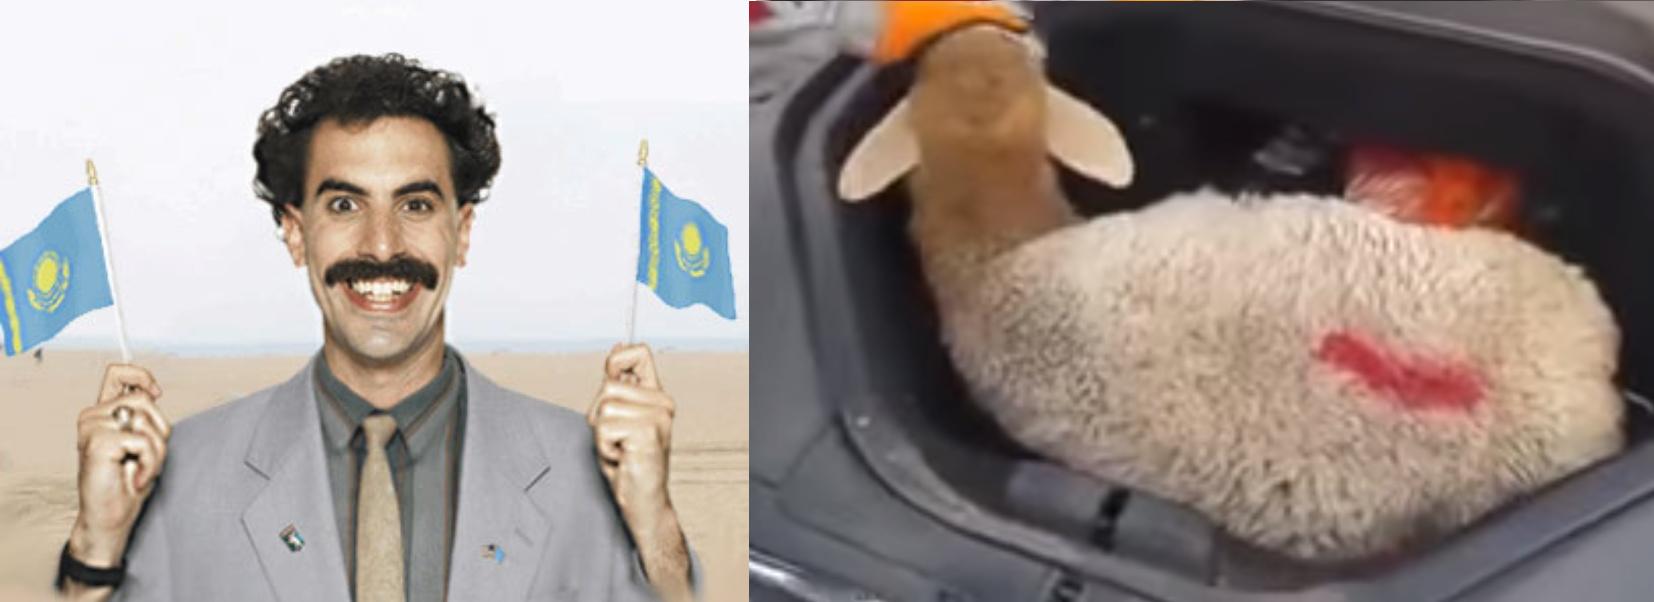 Borat sheep model S